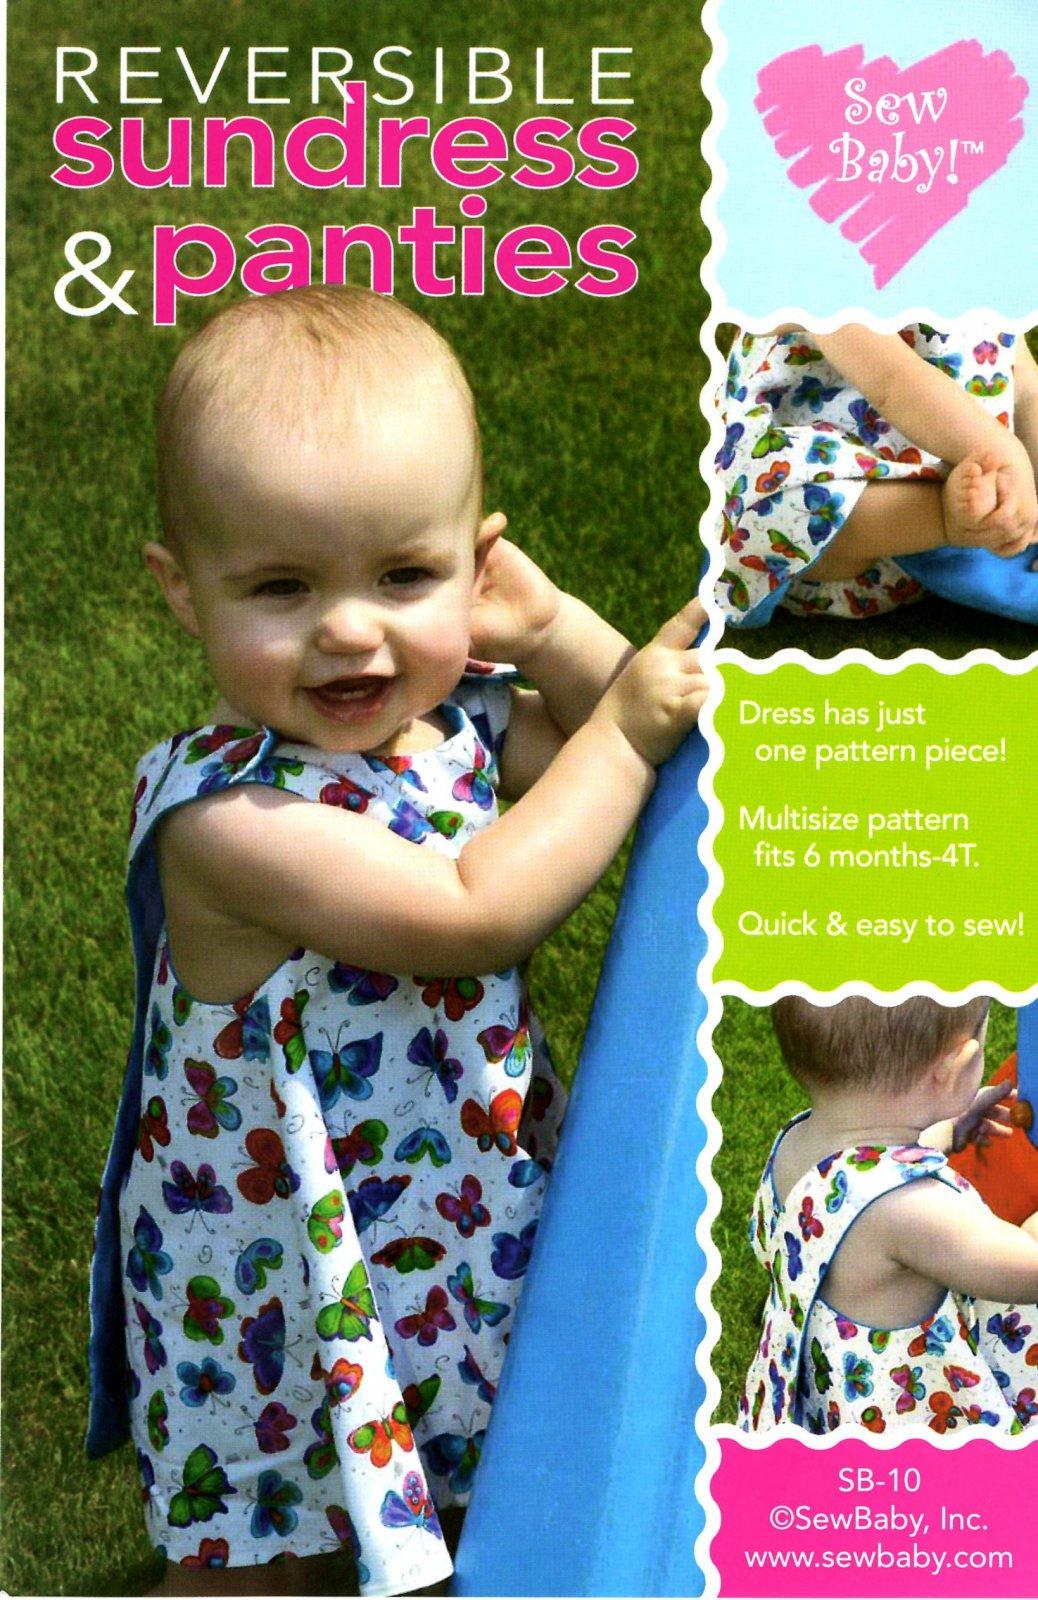 Reversible Sundress & Panties